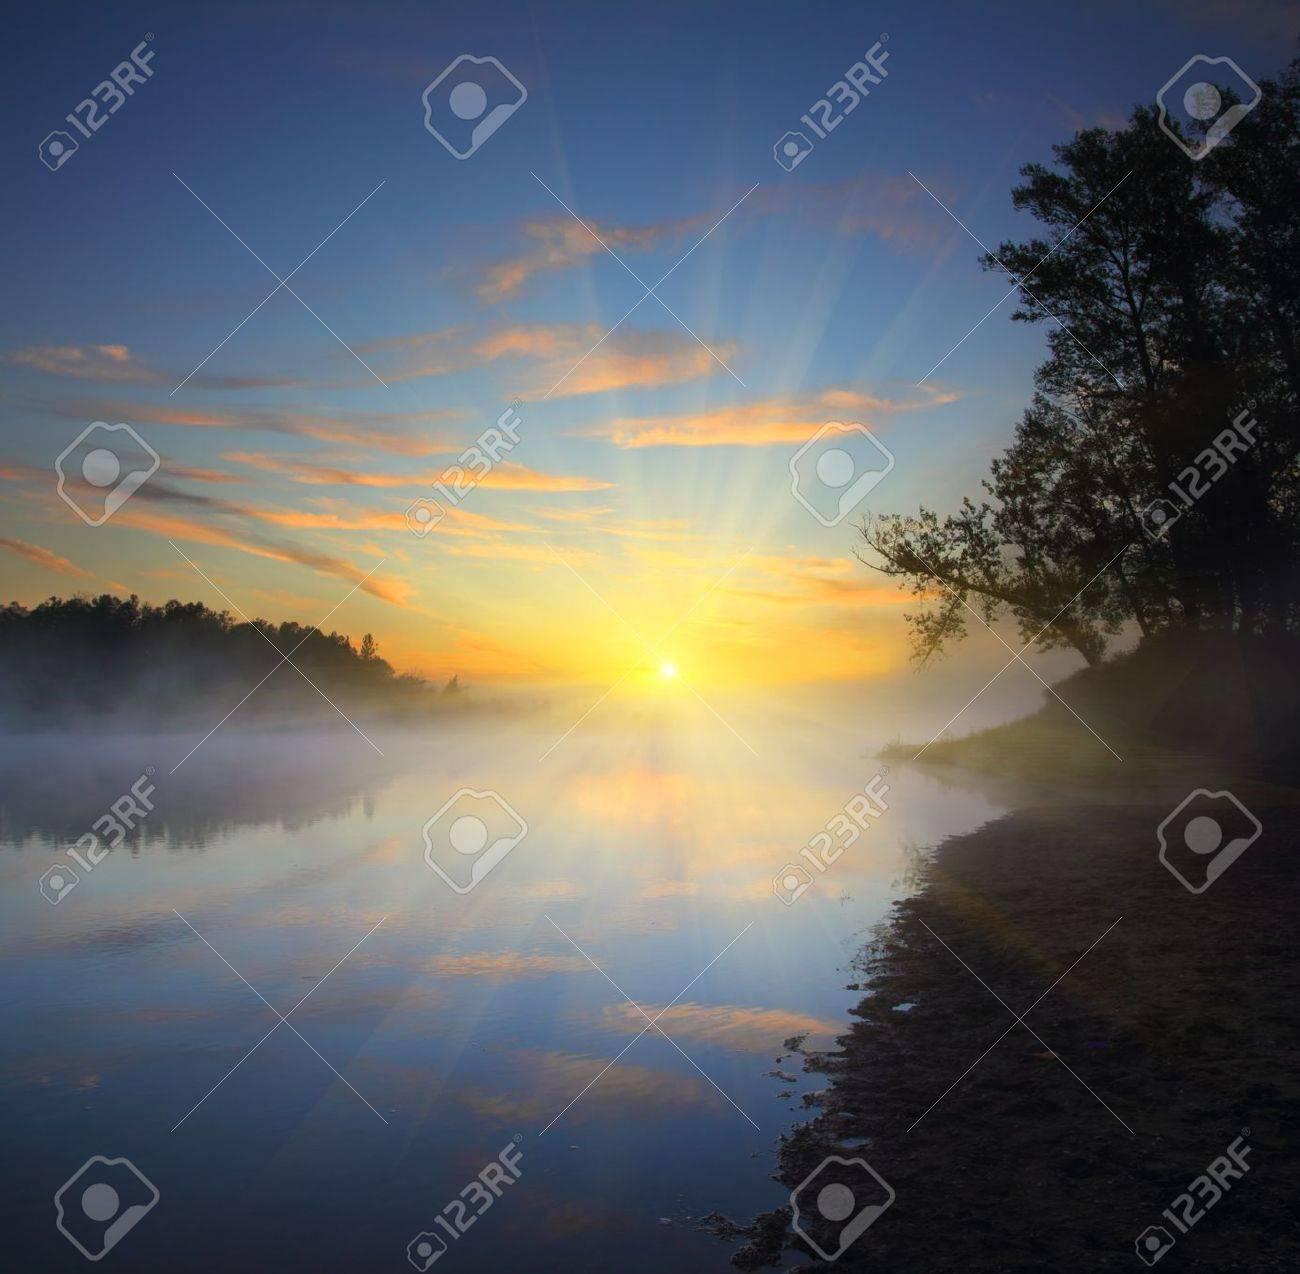 landscape with beautiful fog sunrise on river - 10625563